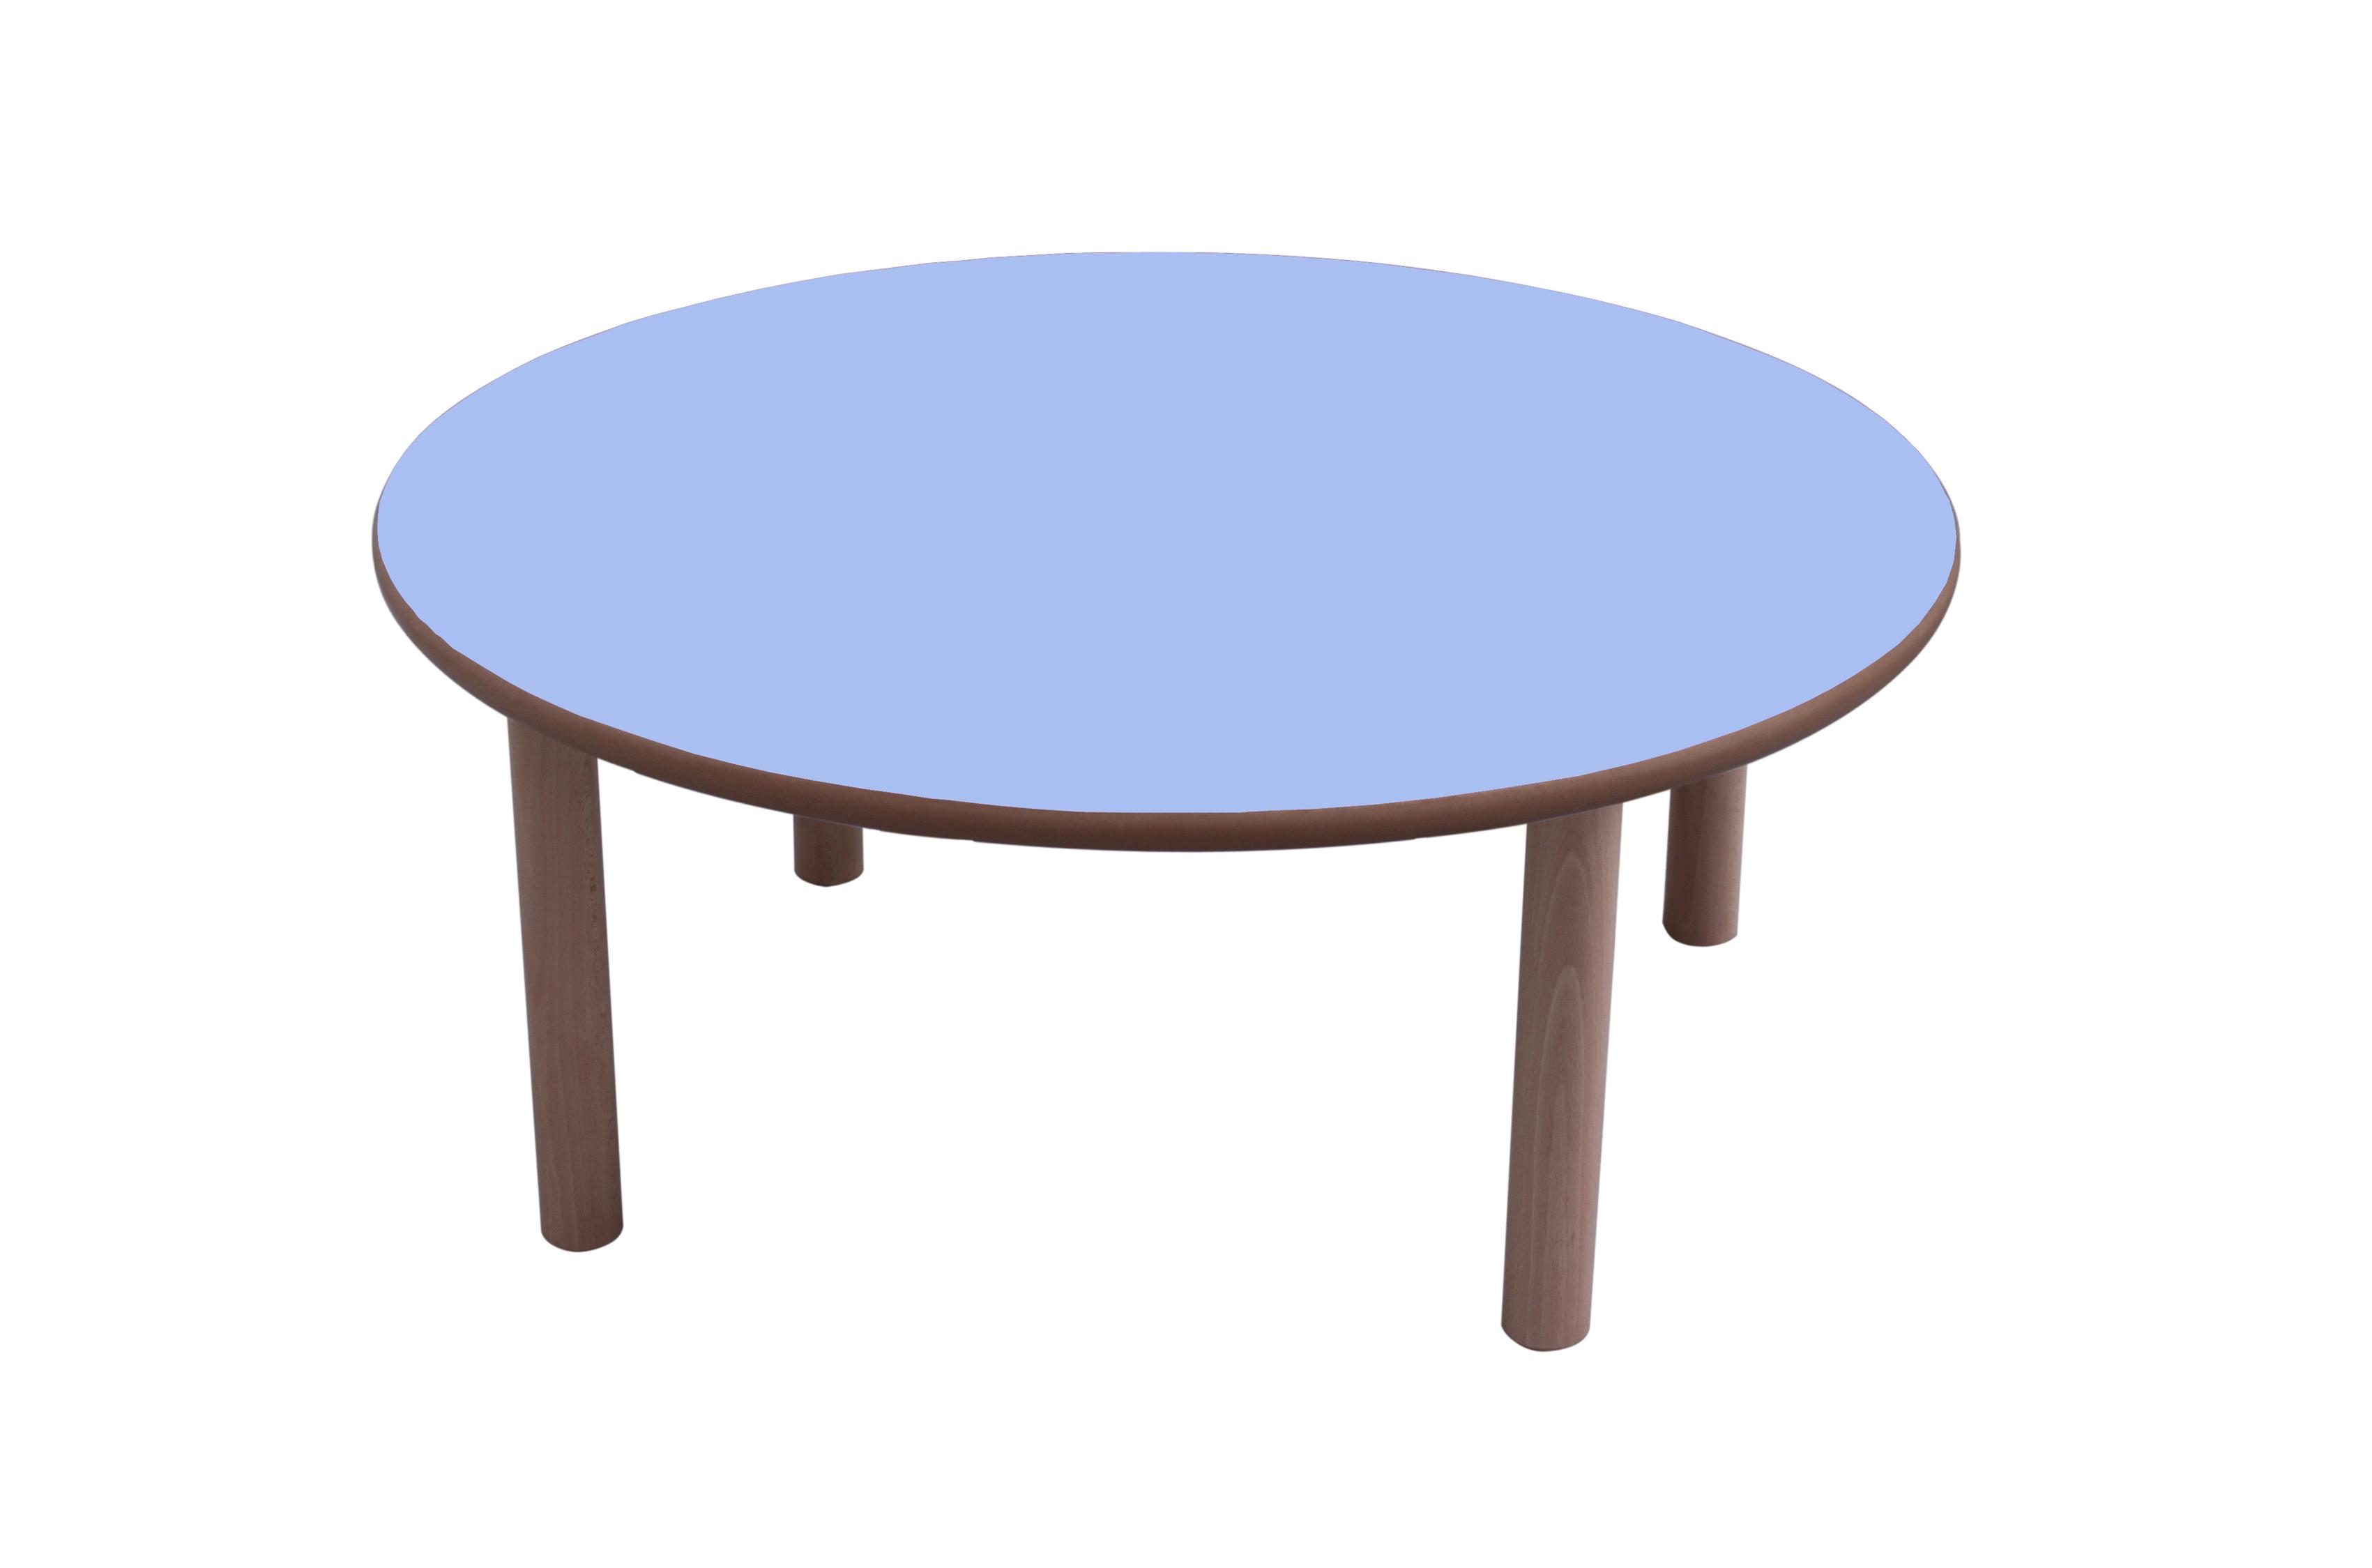 Mesa redonda di metro 120 cm mobiliario for Mesa redonda blanca 120 cm